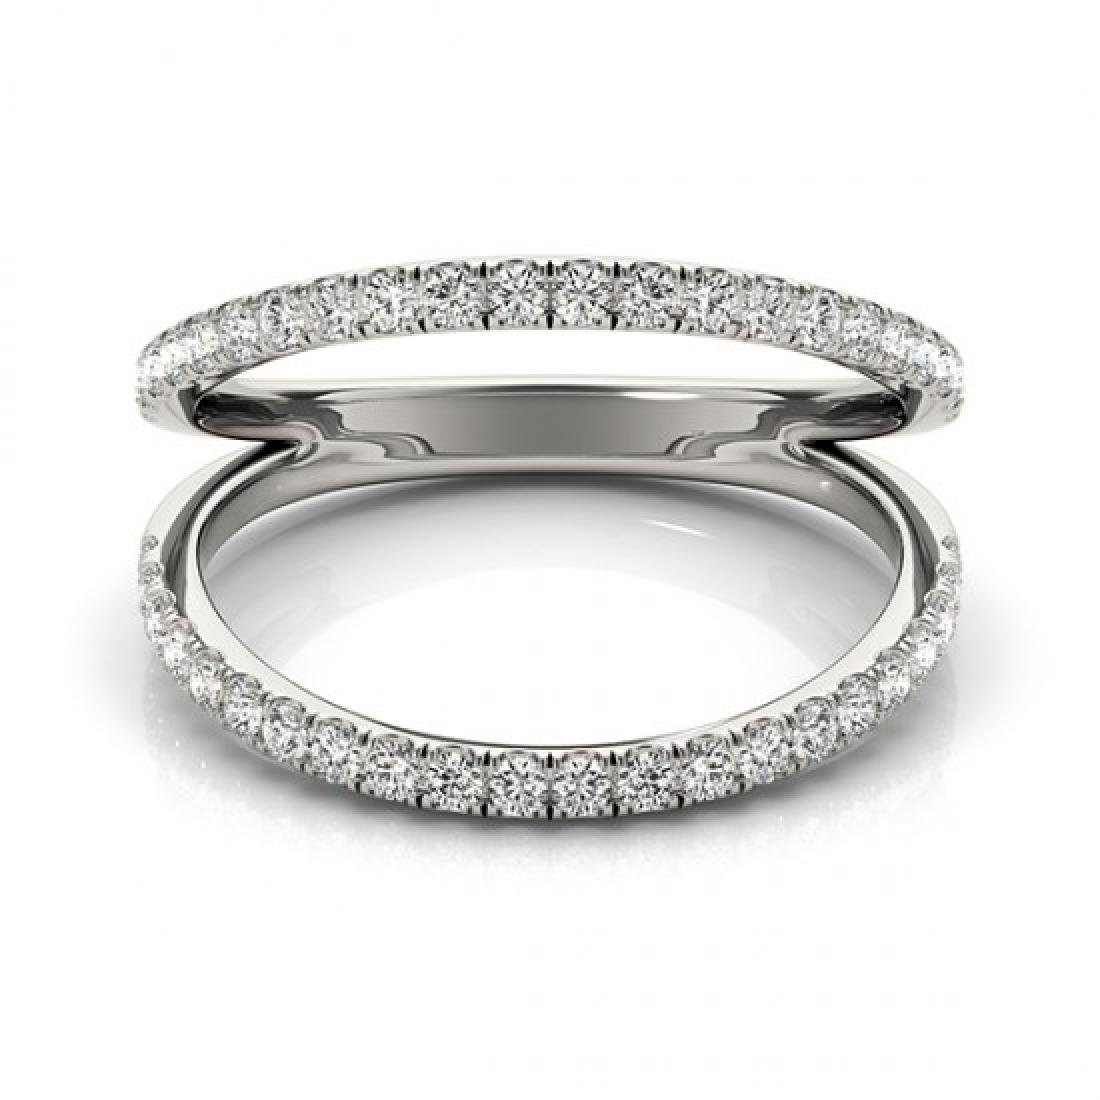 0.33 CTW Certified VS/SI Diamond Fashion Ring 14K White